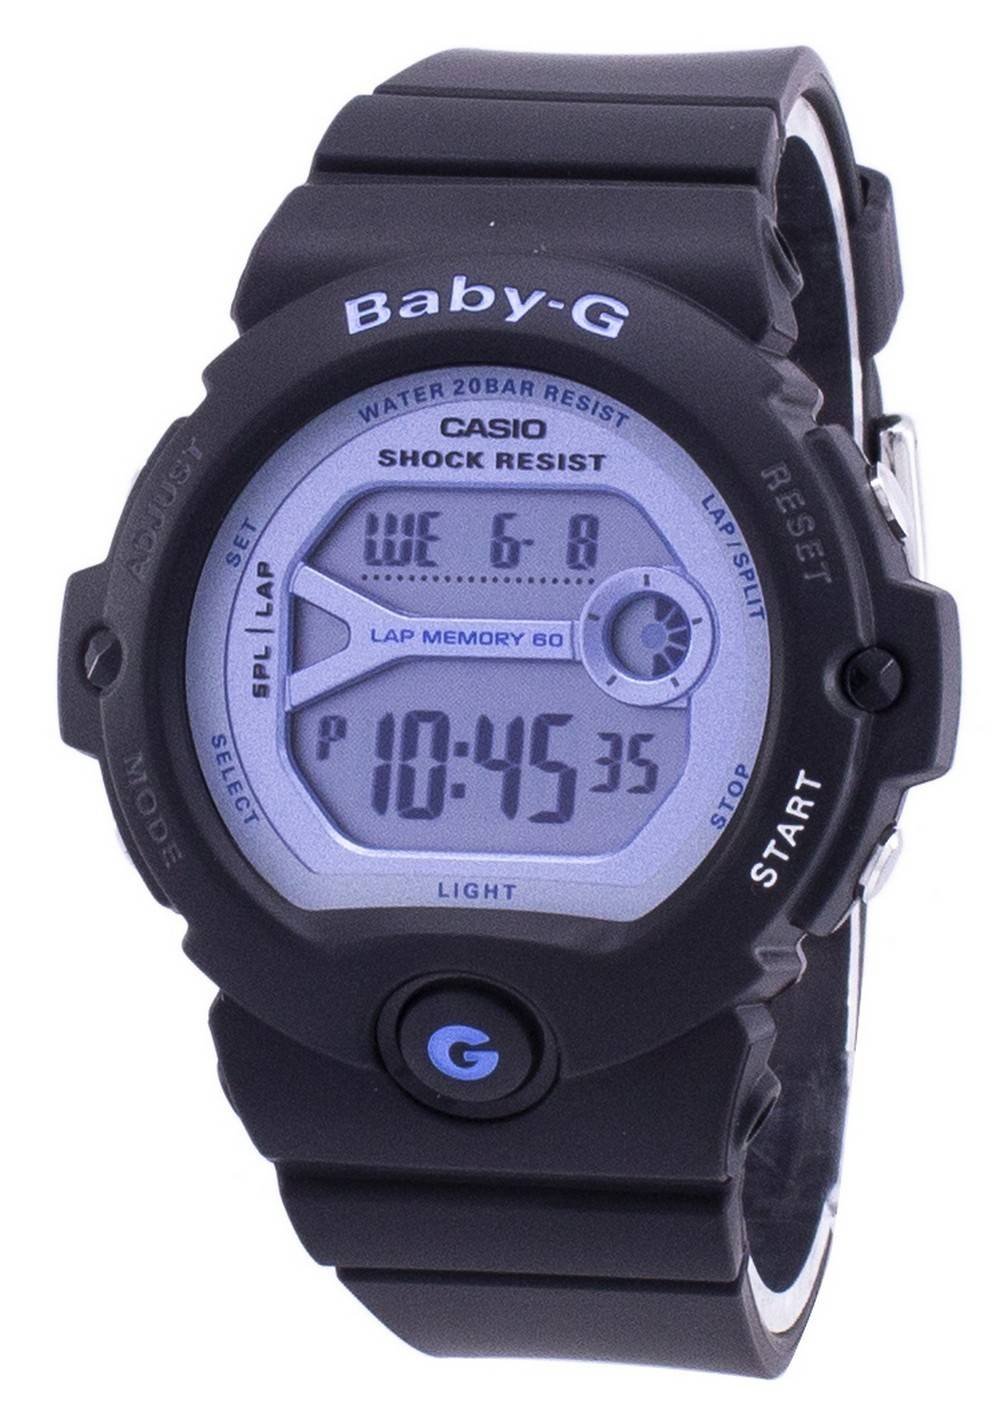 5a8713a05 Casio Running Baby-G Reloj digital para mujer BG-6903-1 BG6903-1 resistente  a los golpes